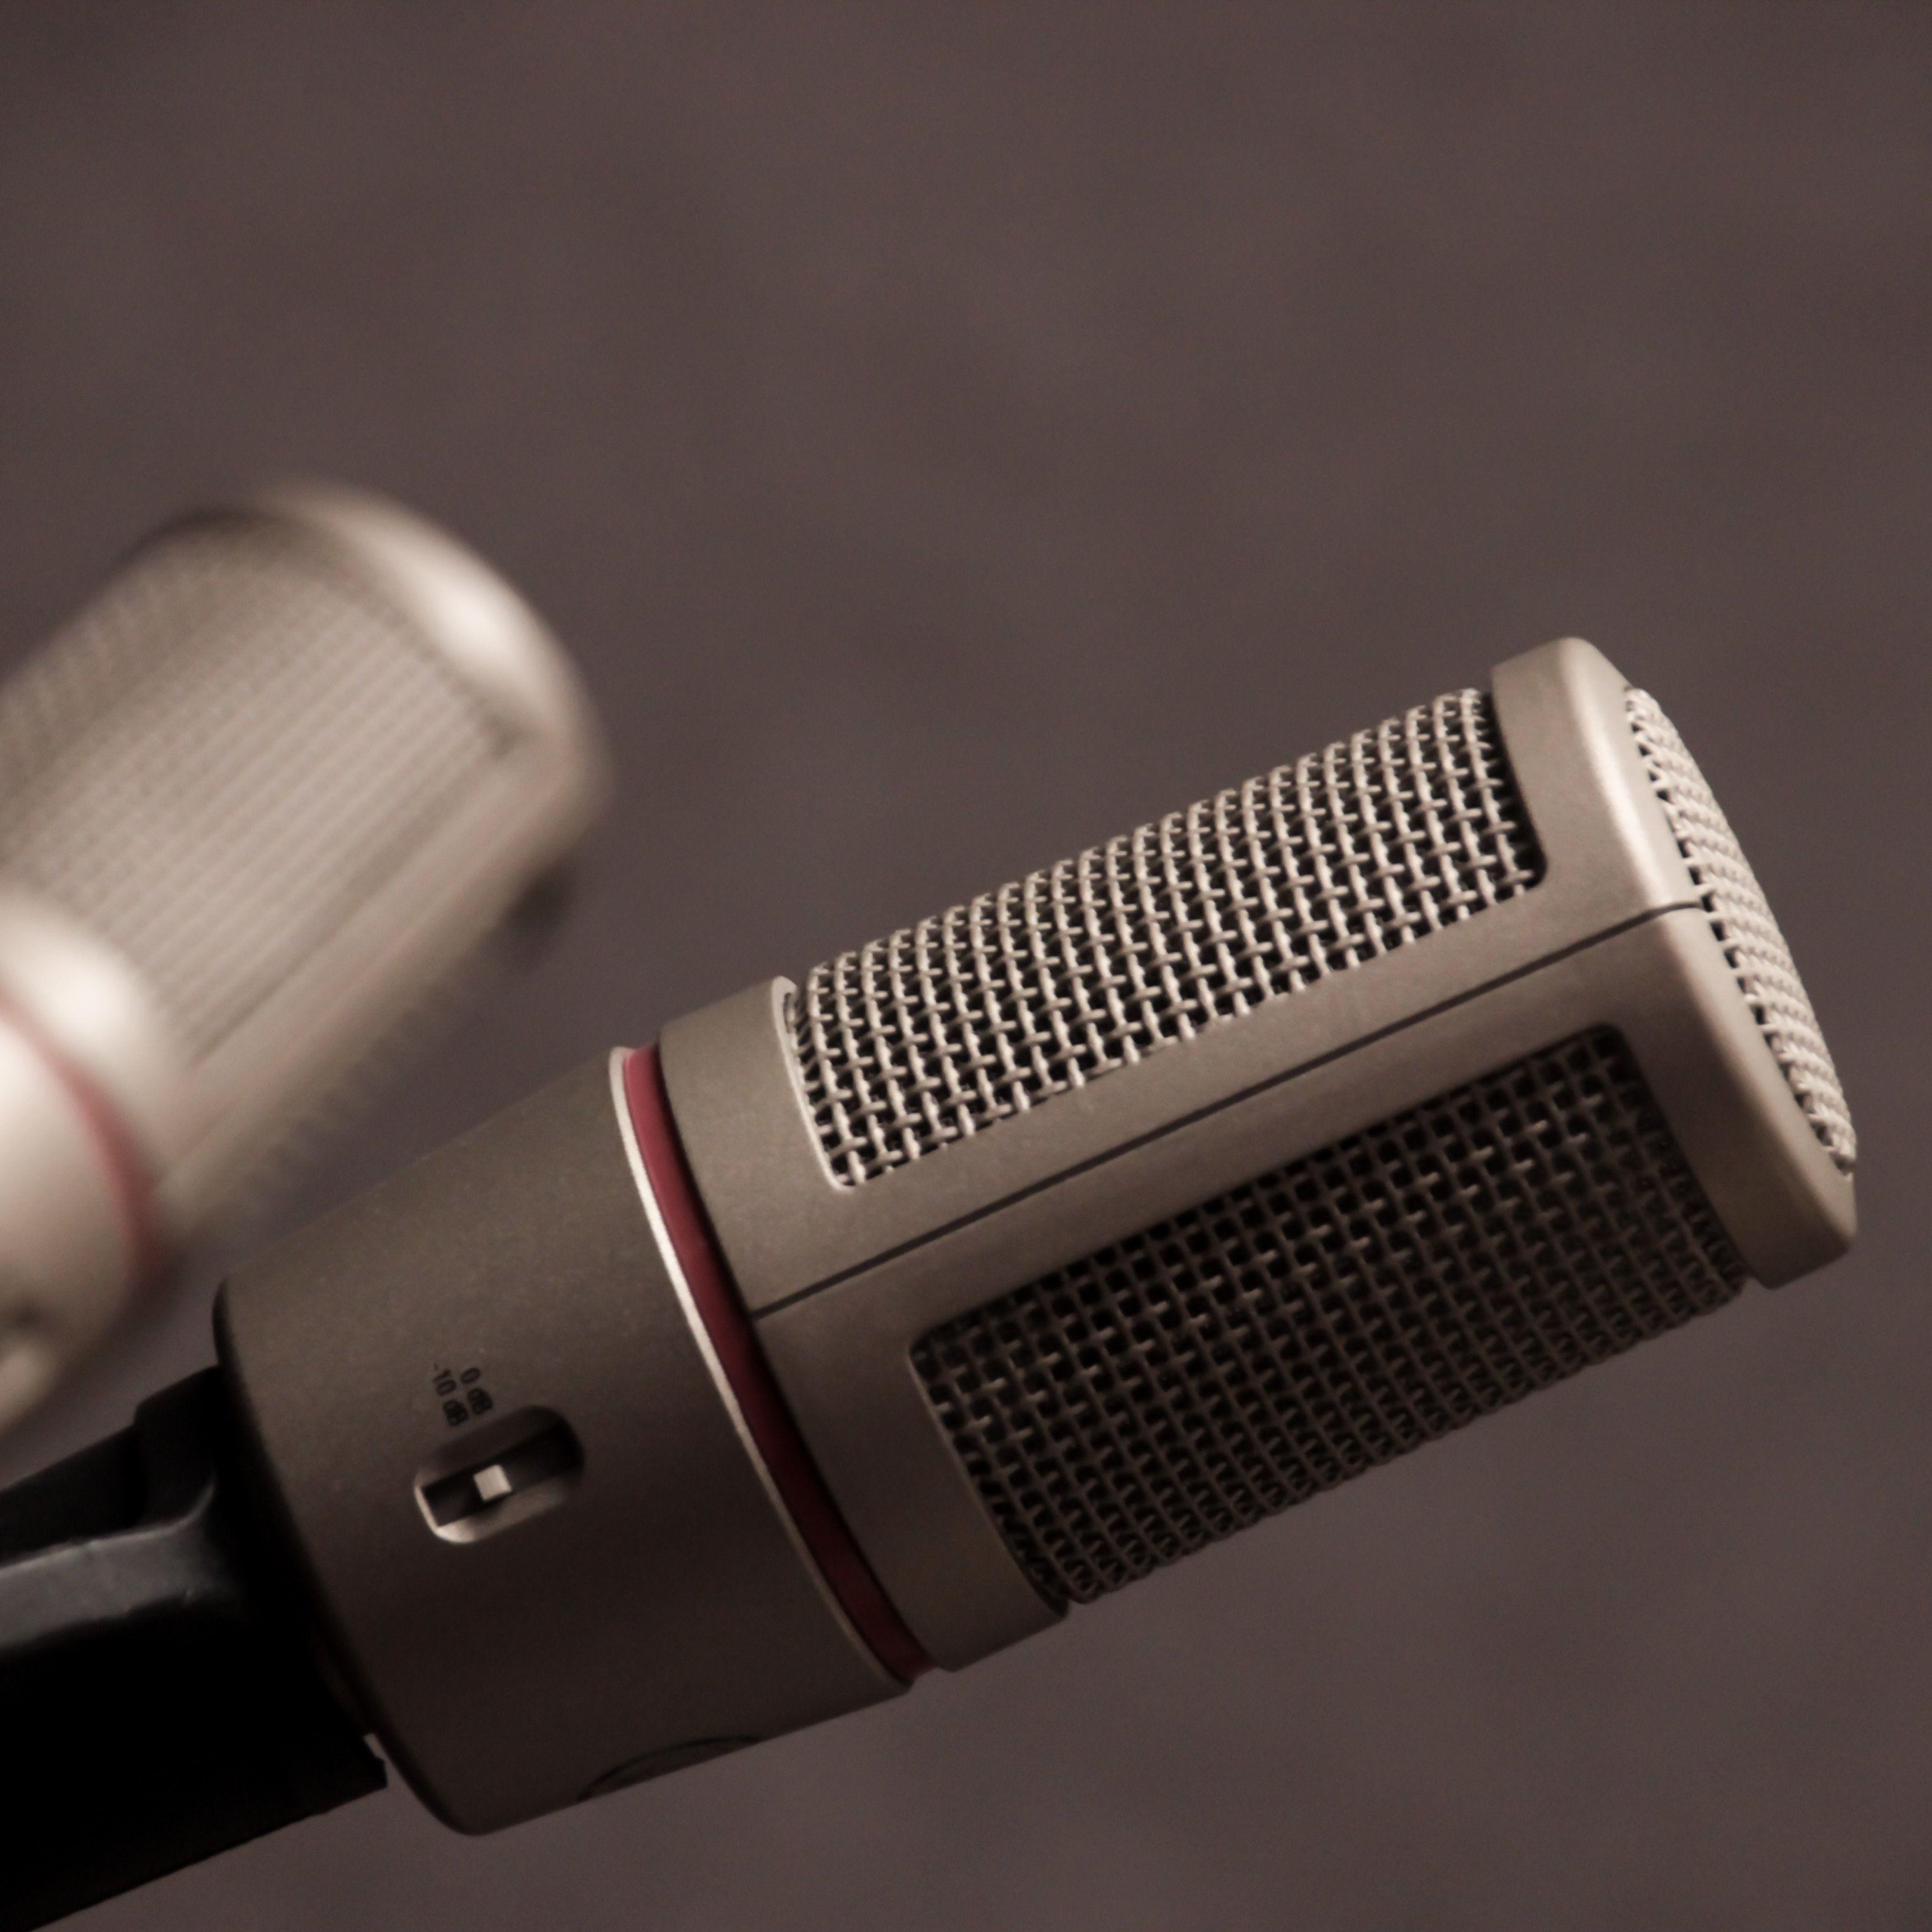 Rush Talk 121: De Voice Revolutie #1 - Nuance